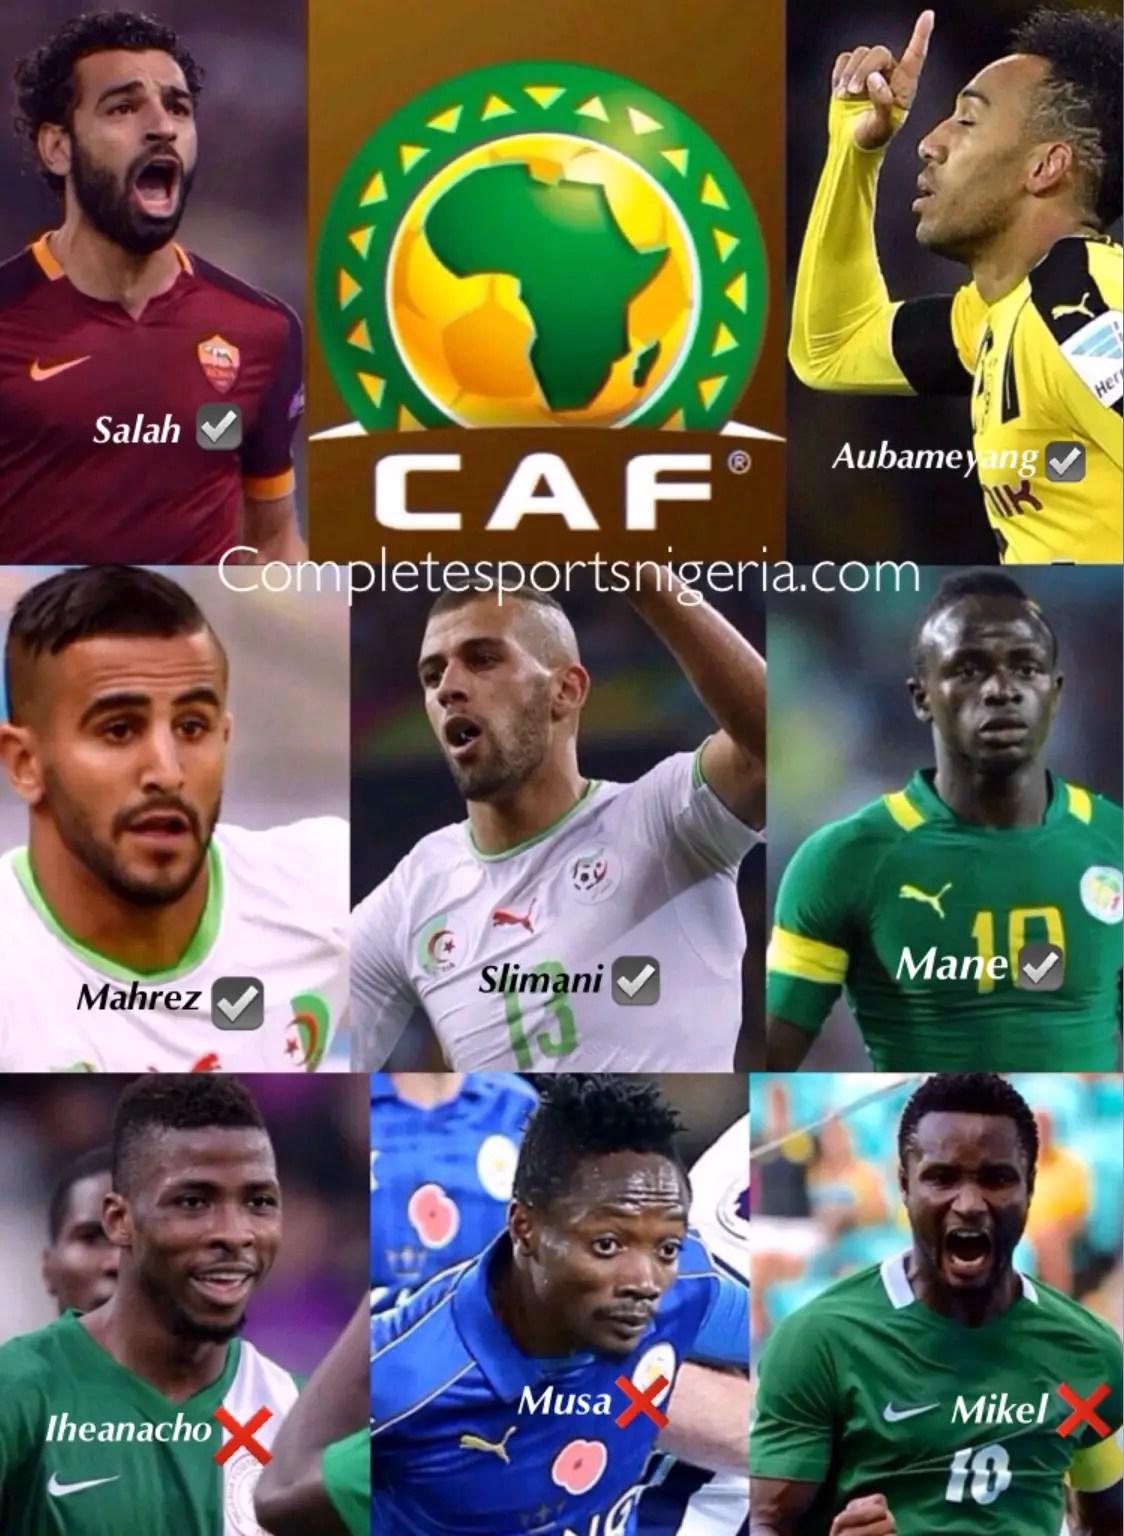 Slimani, Mahrez, Aubameyang, Mane Up For Glo-CAF Award; Mikel, Musa Snubbed